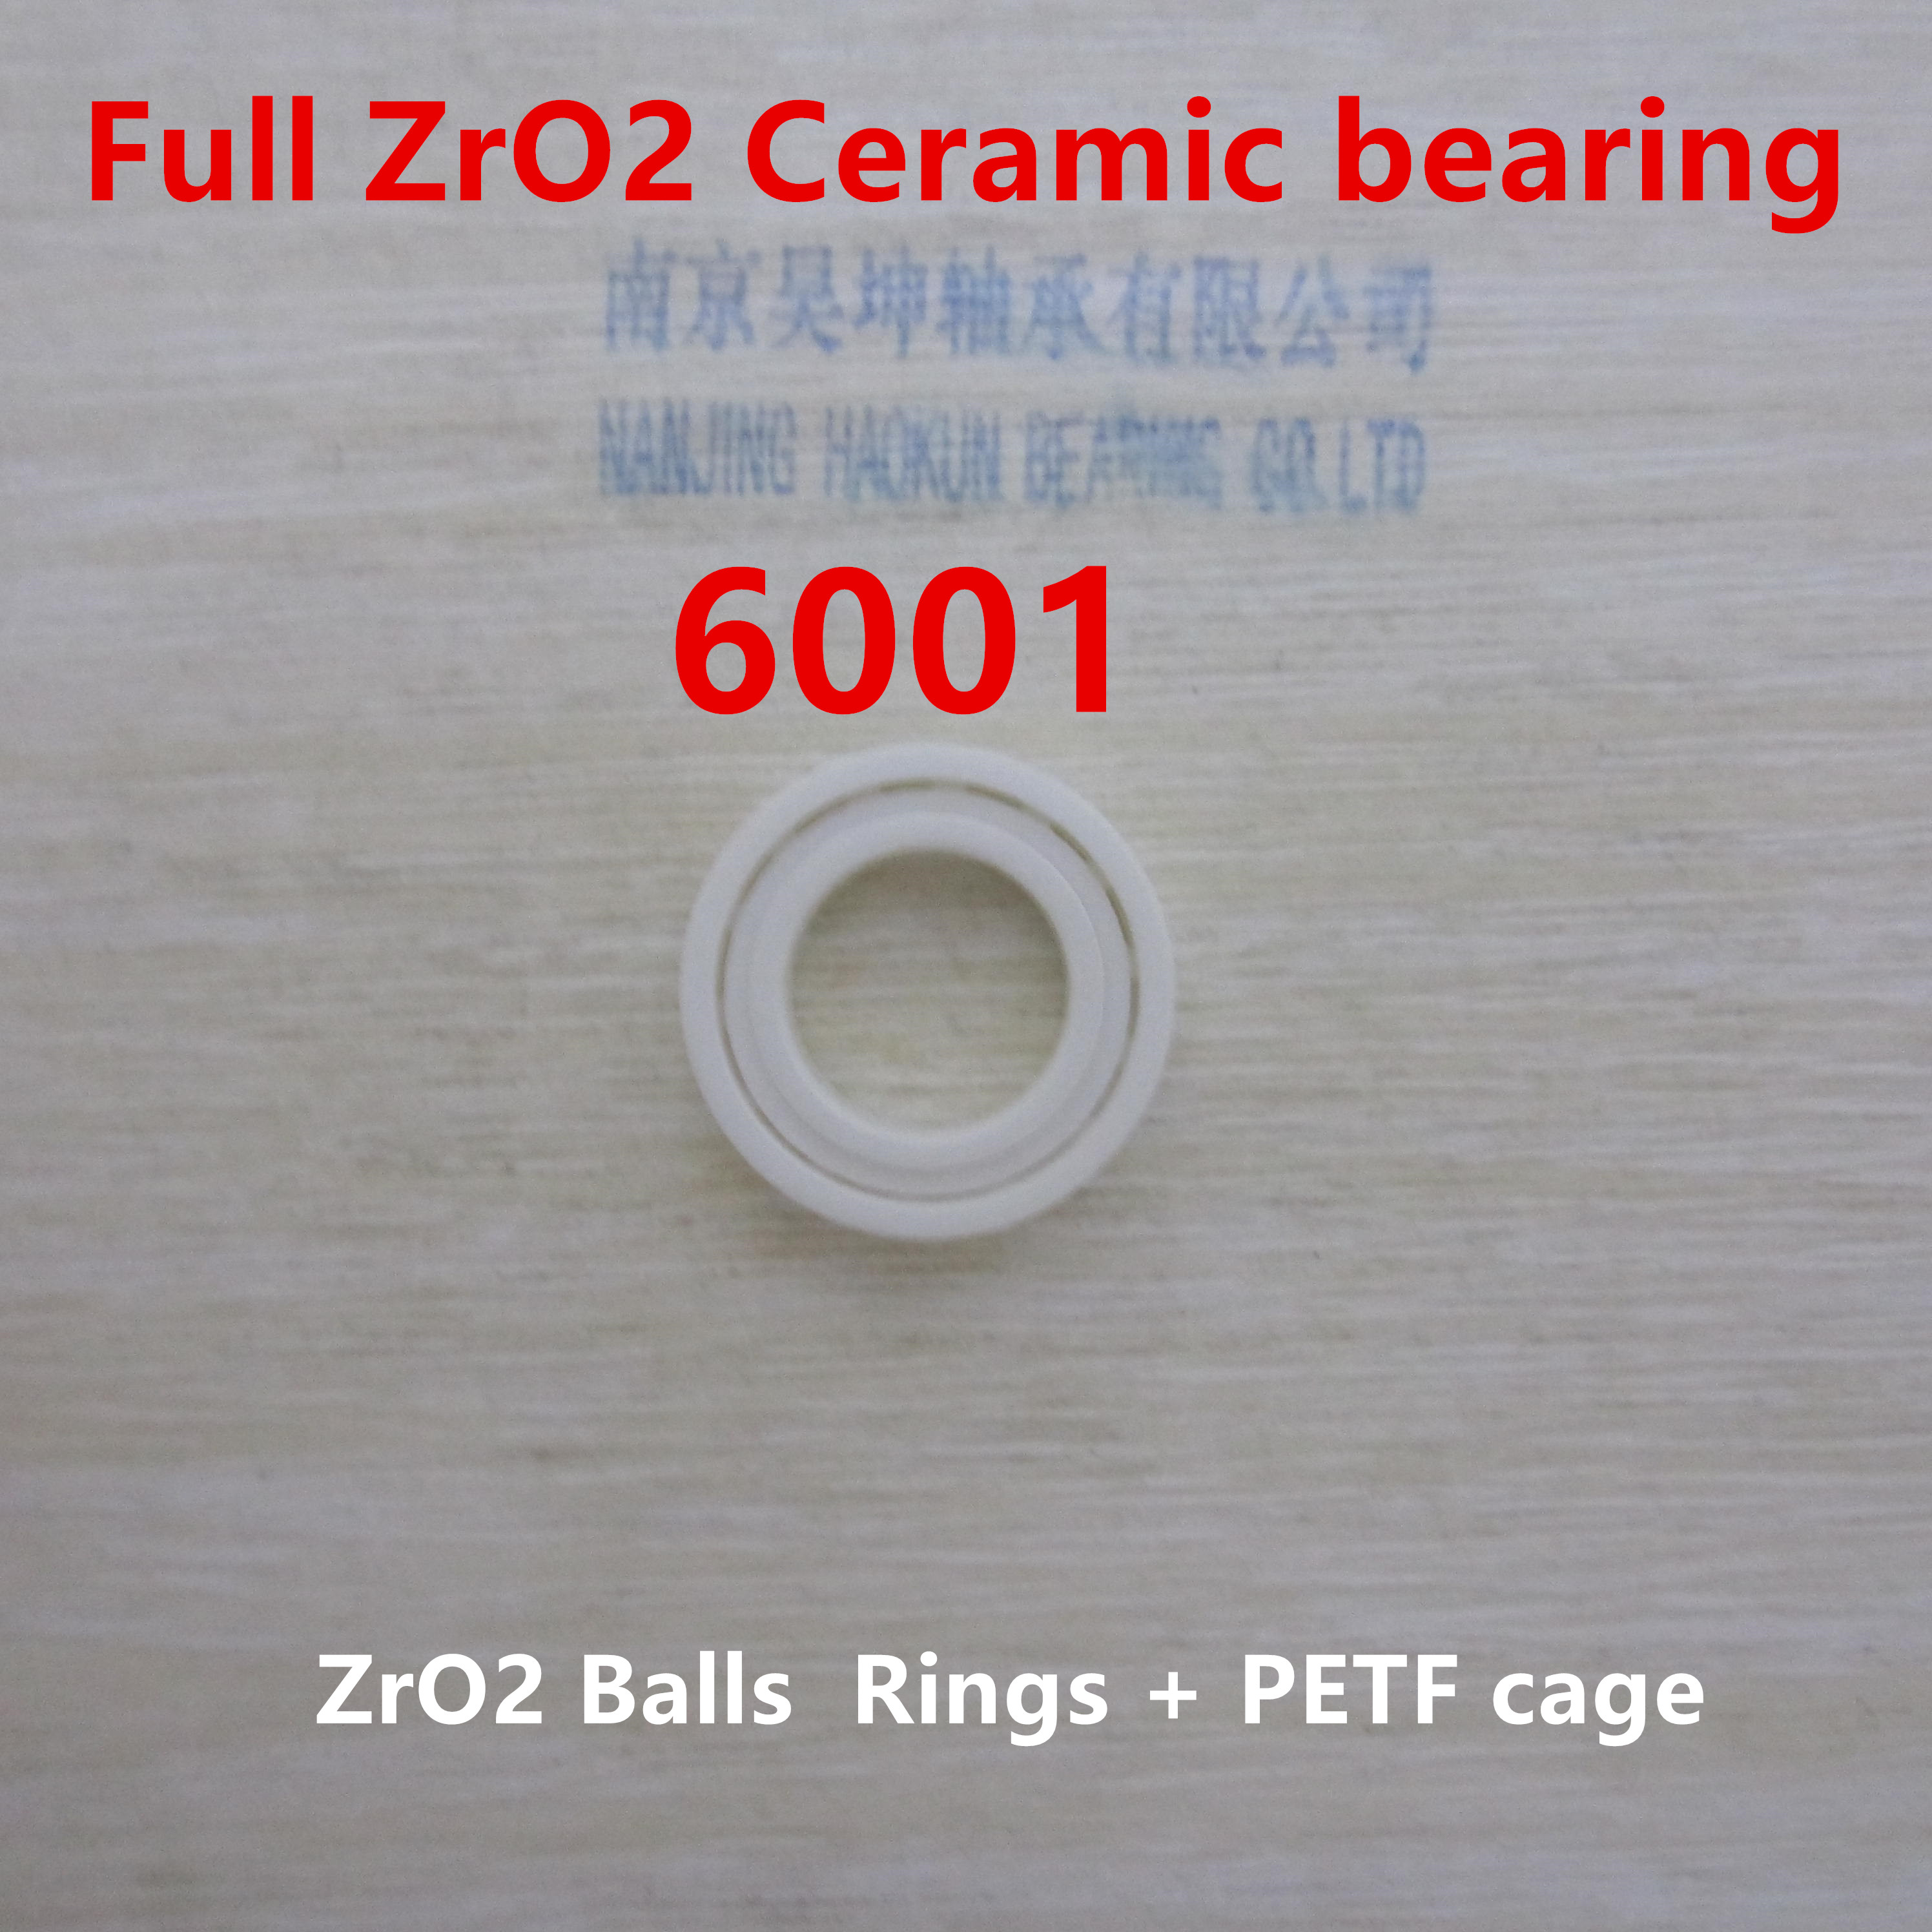 Ceramic bearing 6001 CE 12X28X8MM ceramic ball bearing zro2 dali rubicon vokal black